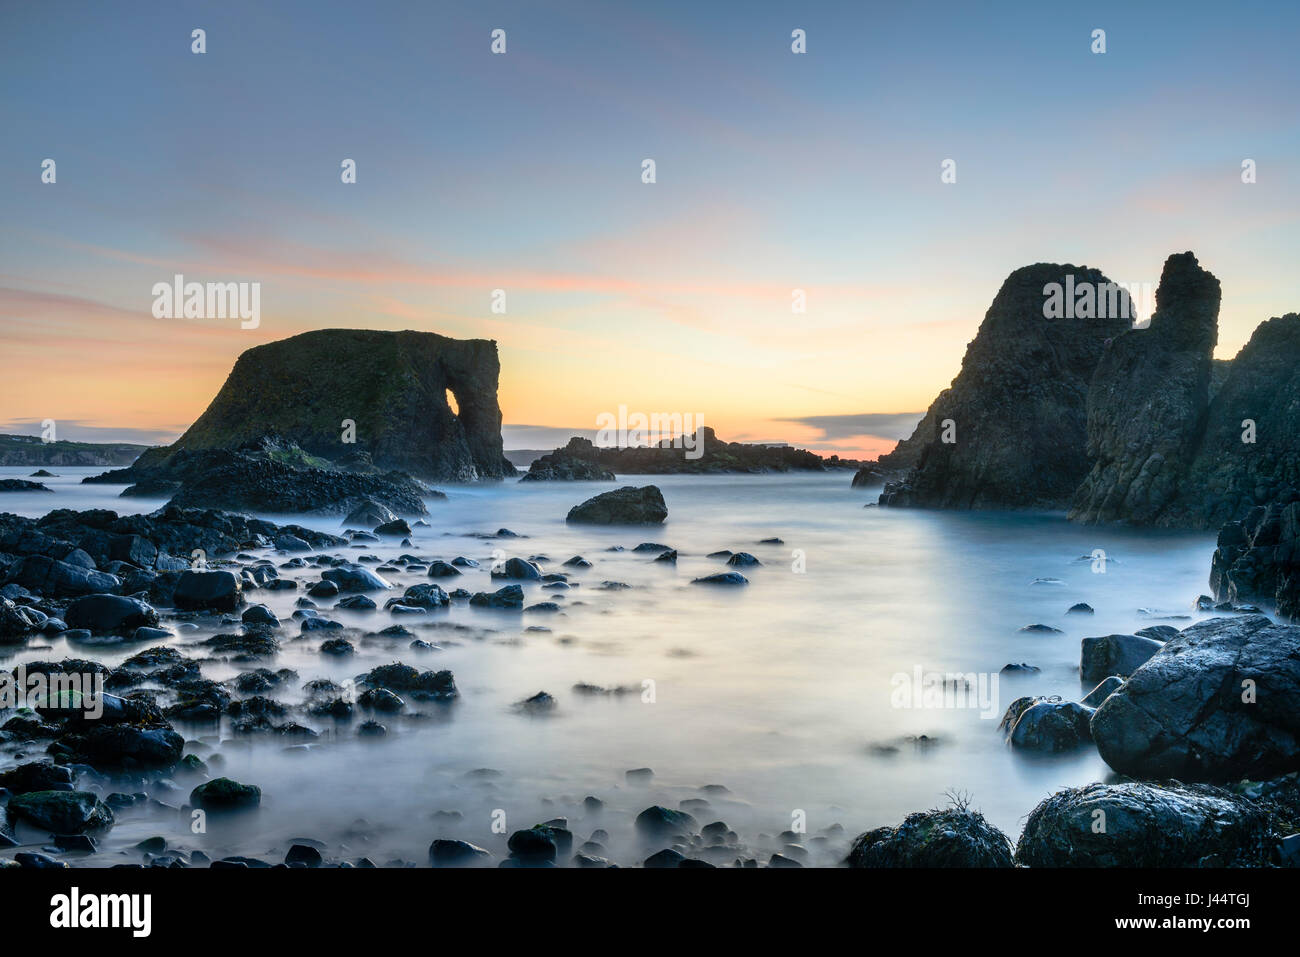 Sunset at Elephant Rock at Carricknaford a coastal scene of rocky shore near Ballintoy and Whitepark Bay on the Antrim coast of Northern Ireland Stock Photo